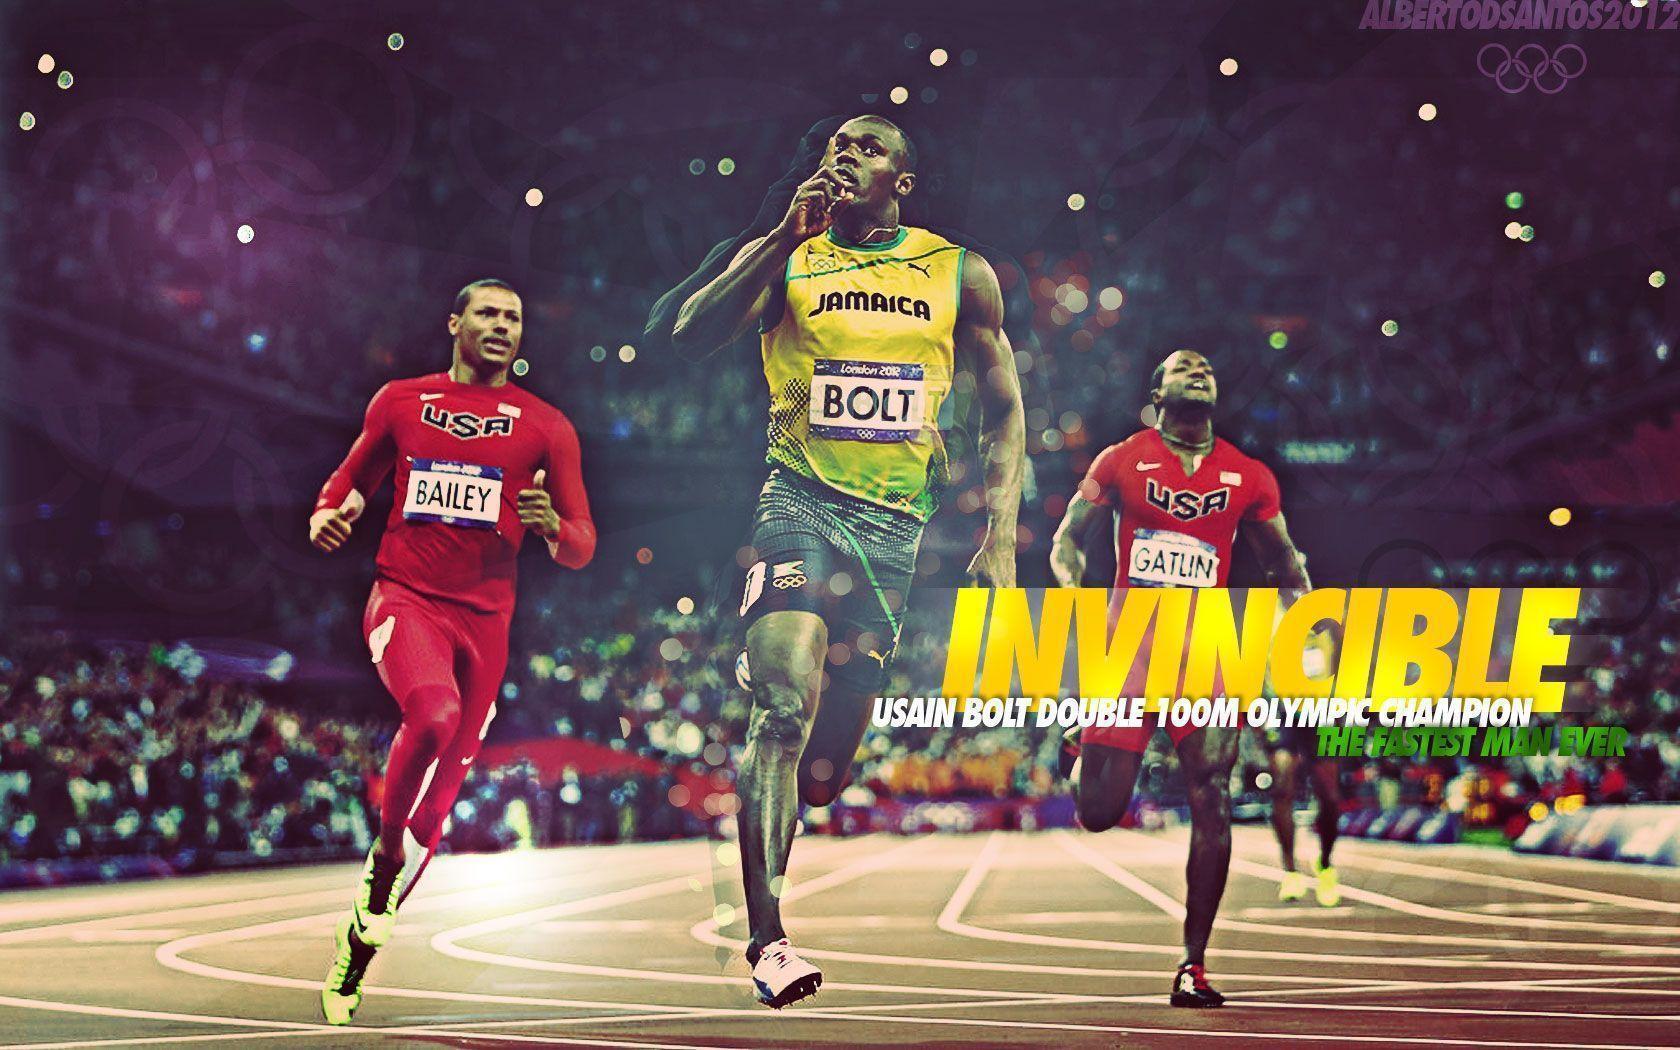 Free Wallpapers - Usain Bolt 2012 1680x1050 wallpaper